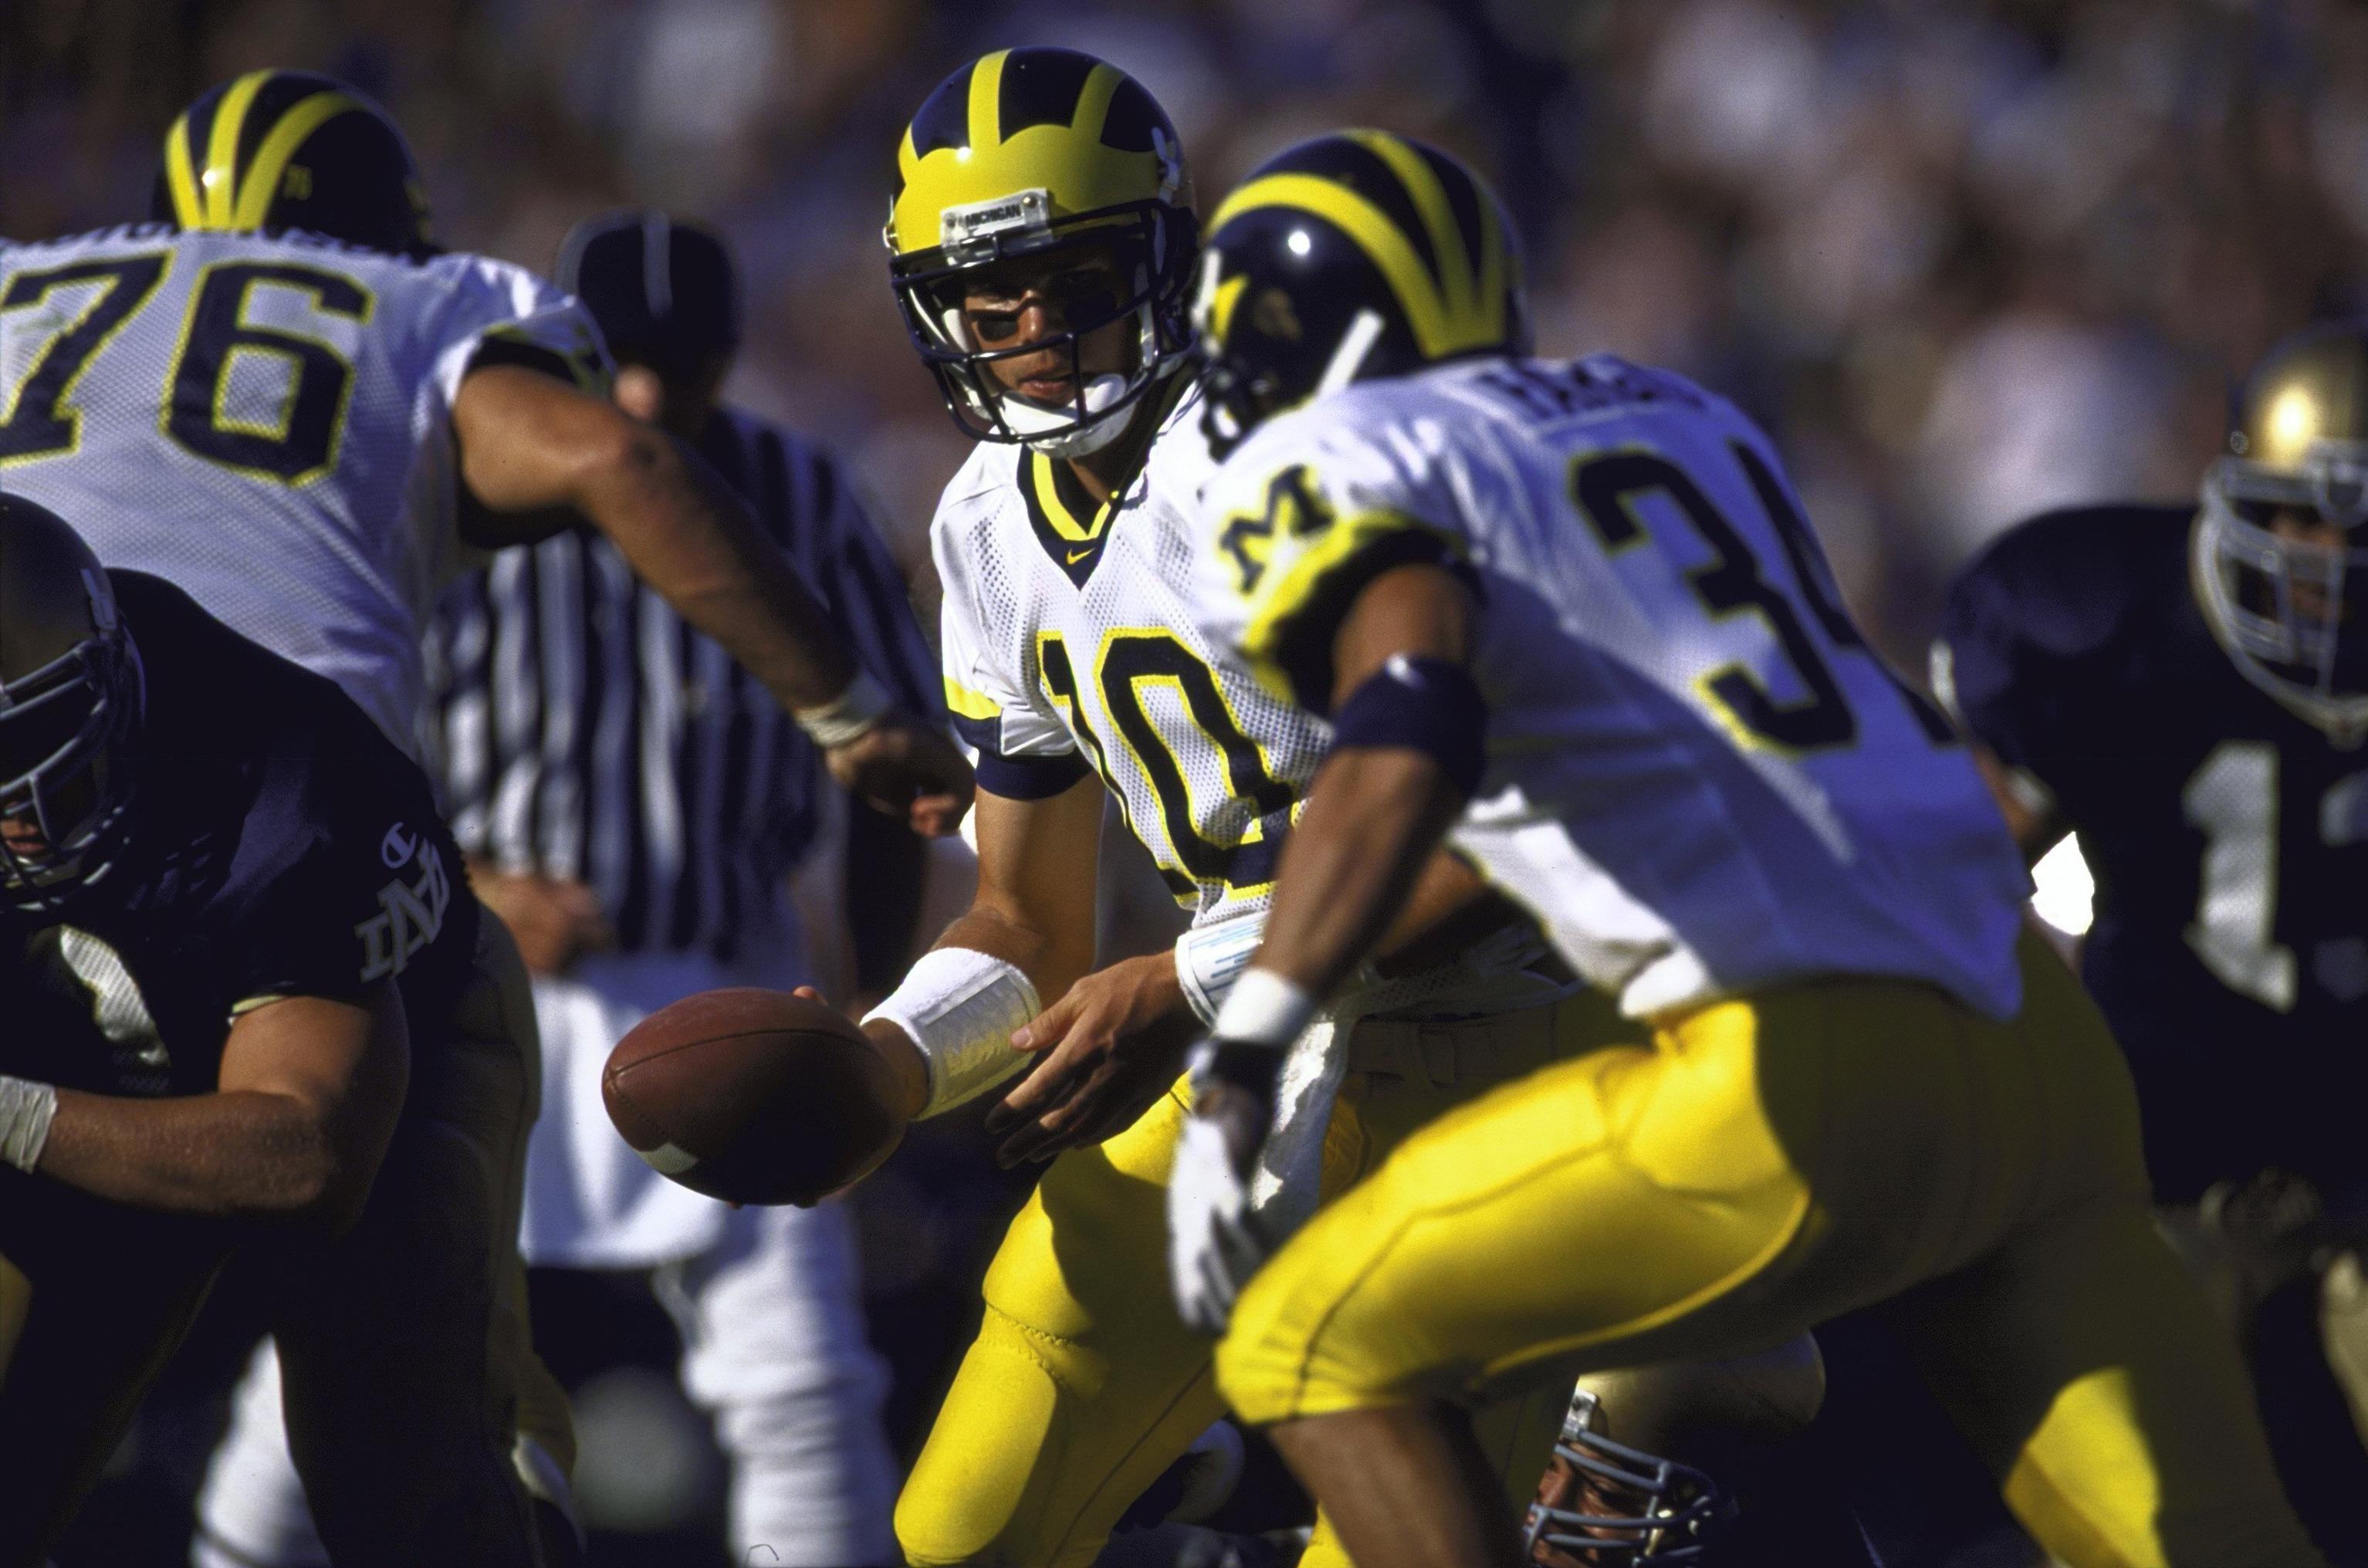 University of Michigan QB Tom Brady